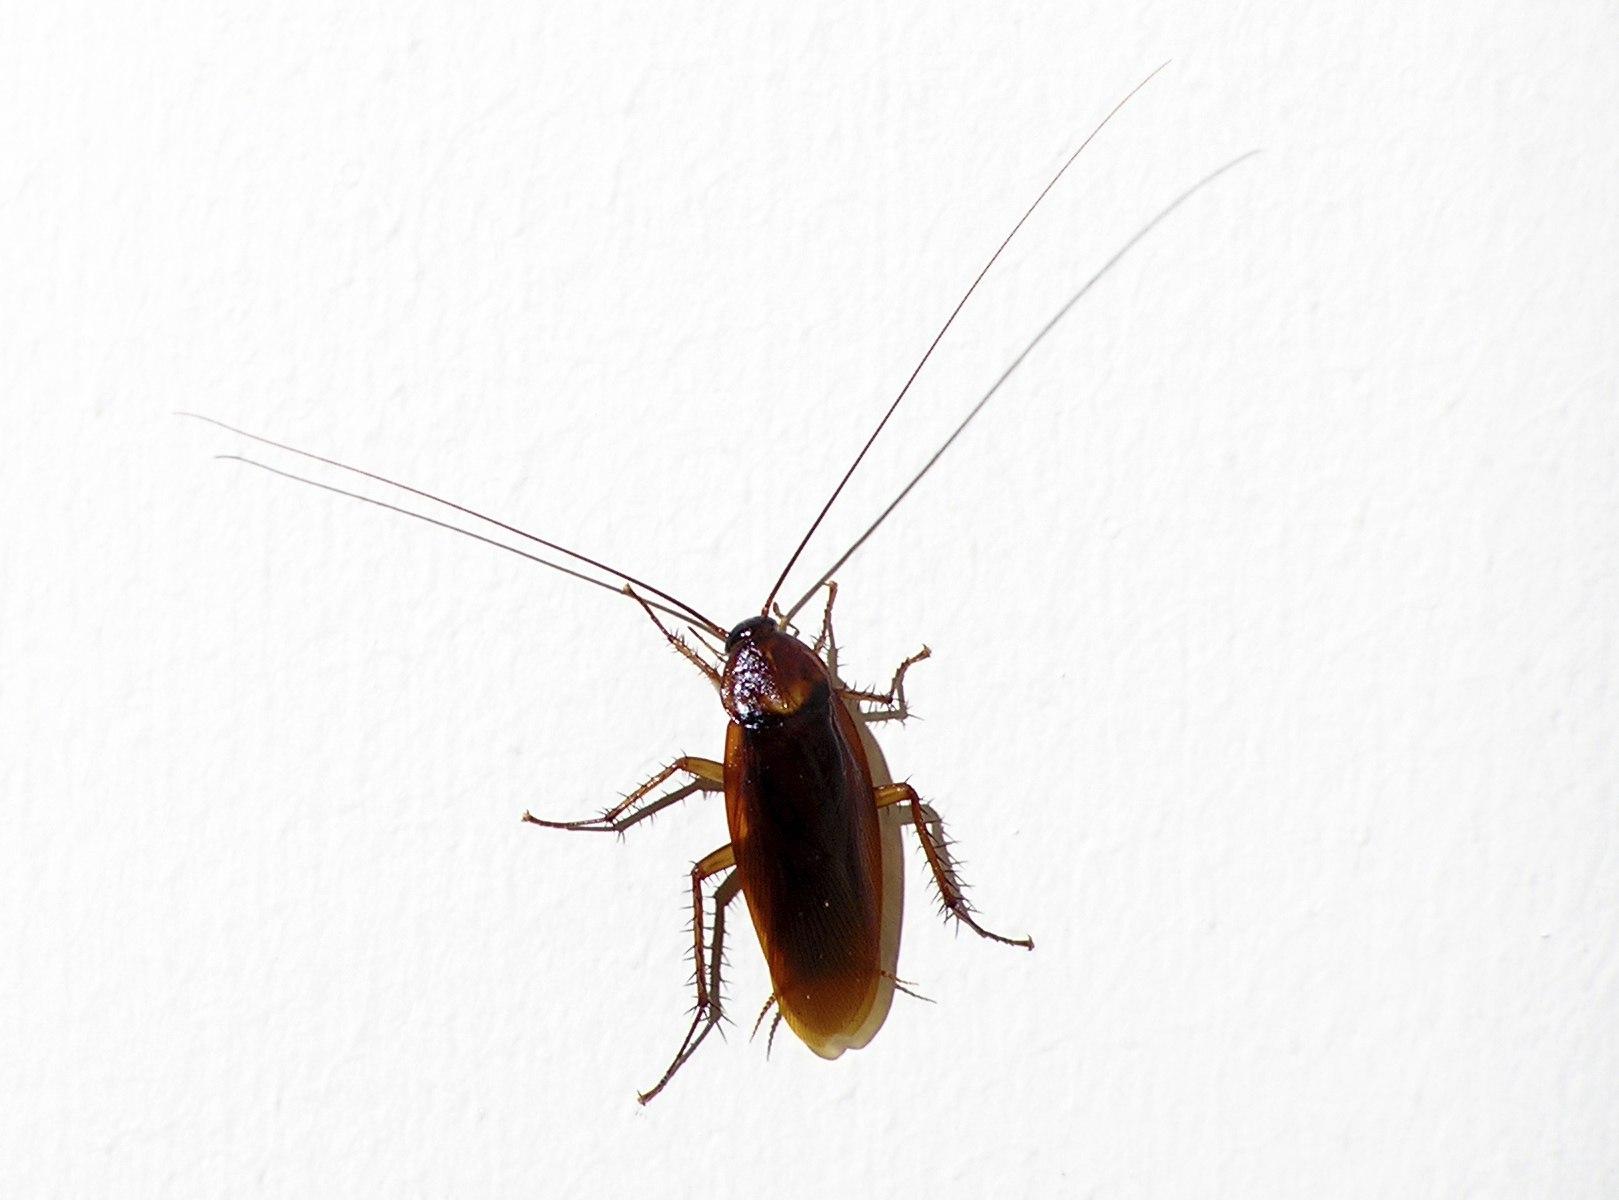 Smokey Brown Roach in North Georgia  sc 1 st  Canton Termite And Pest Control & Bugs | Canton Georgia Termite u0026 Pest Control